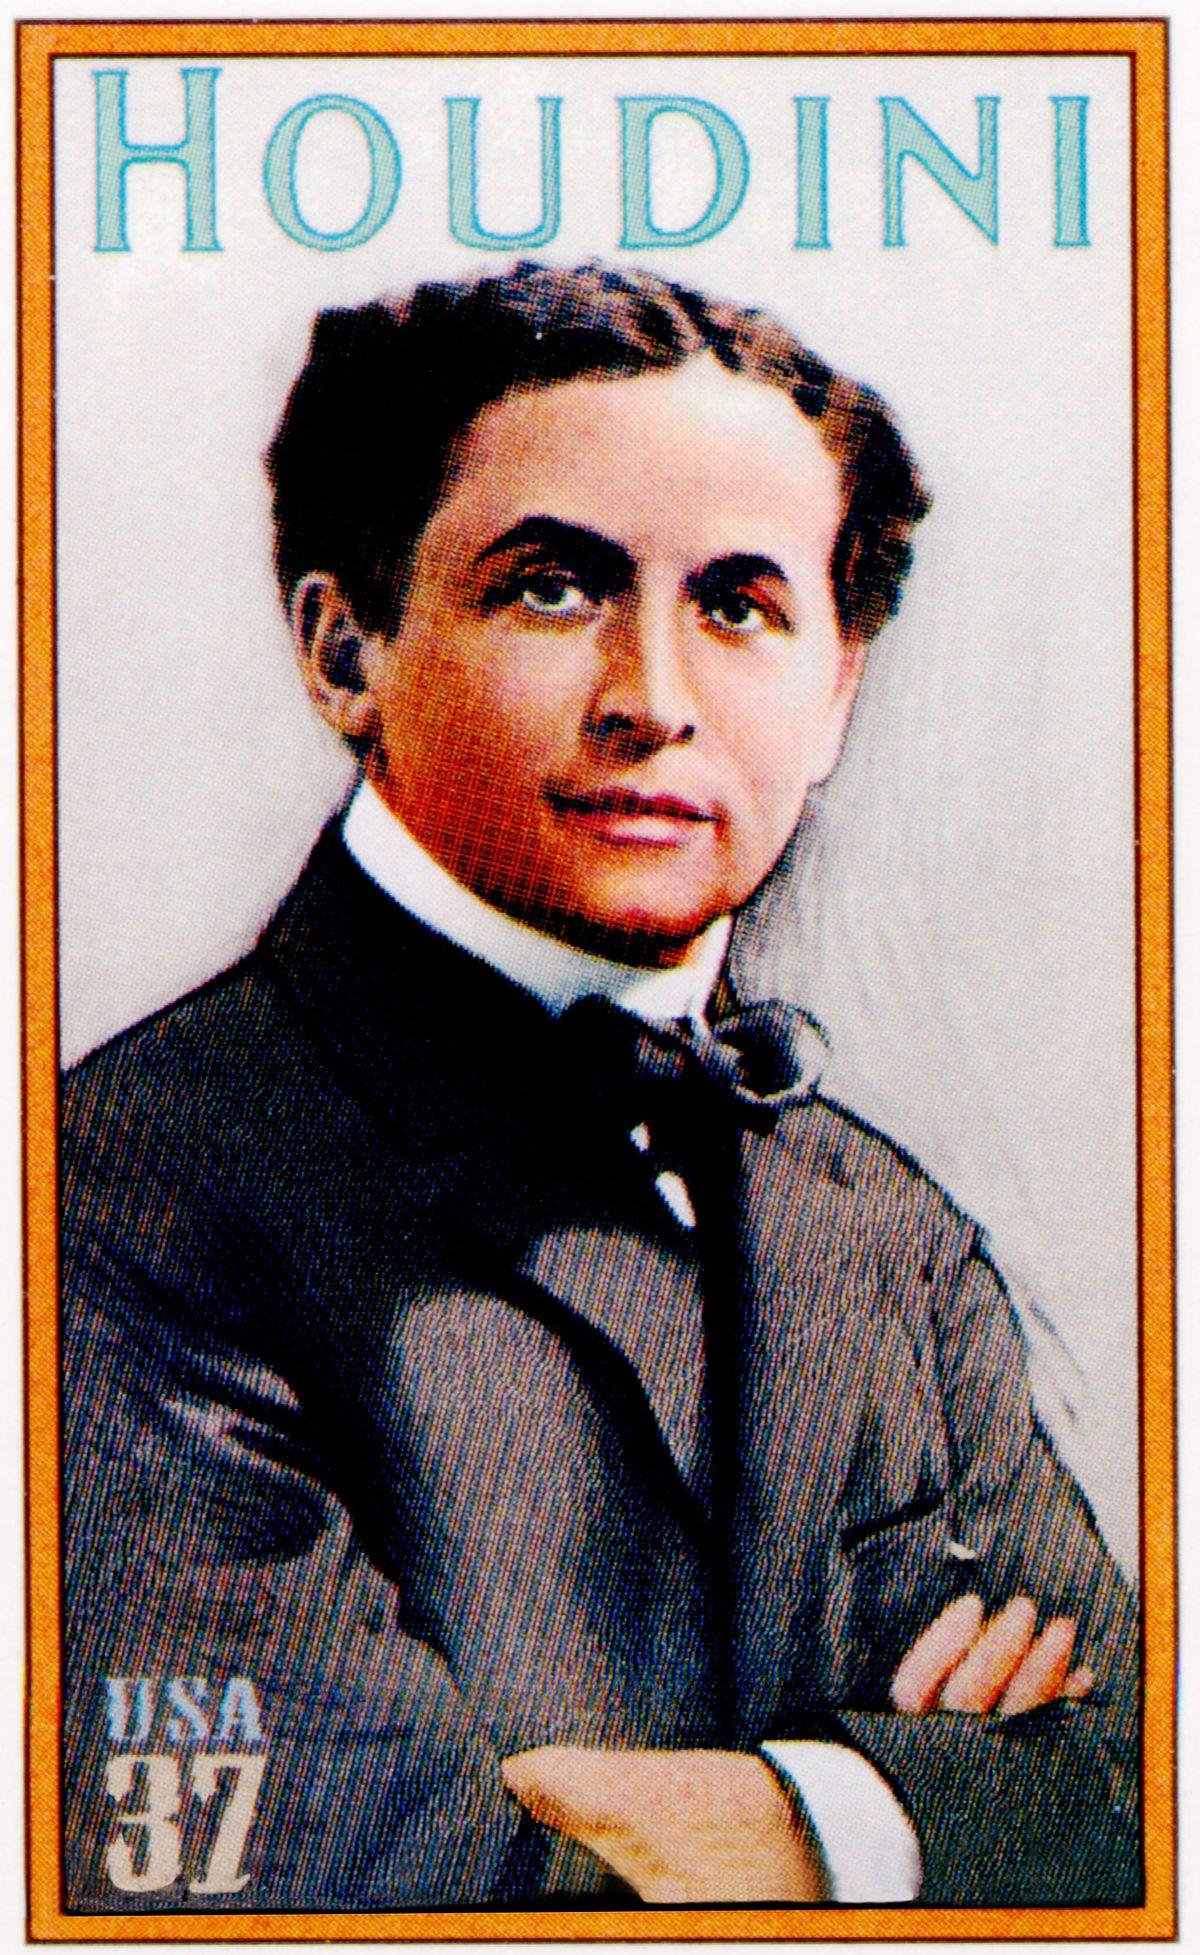 Houdini Stamp Unveiled